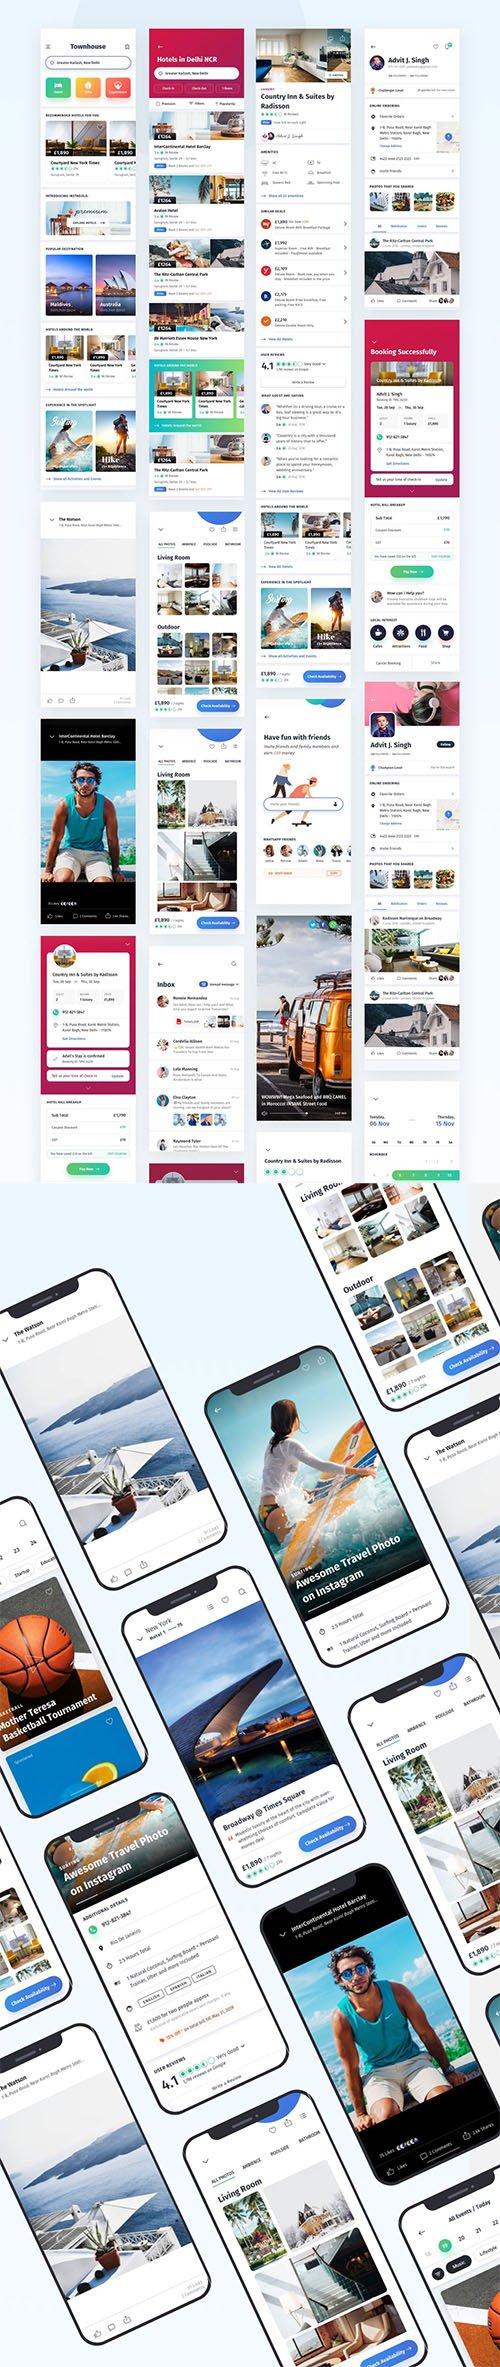 Townhouse Mobile App UI Kit